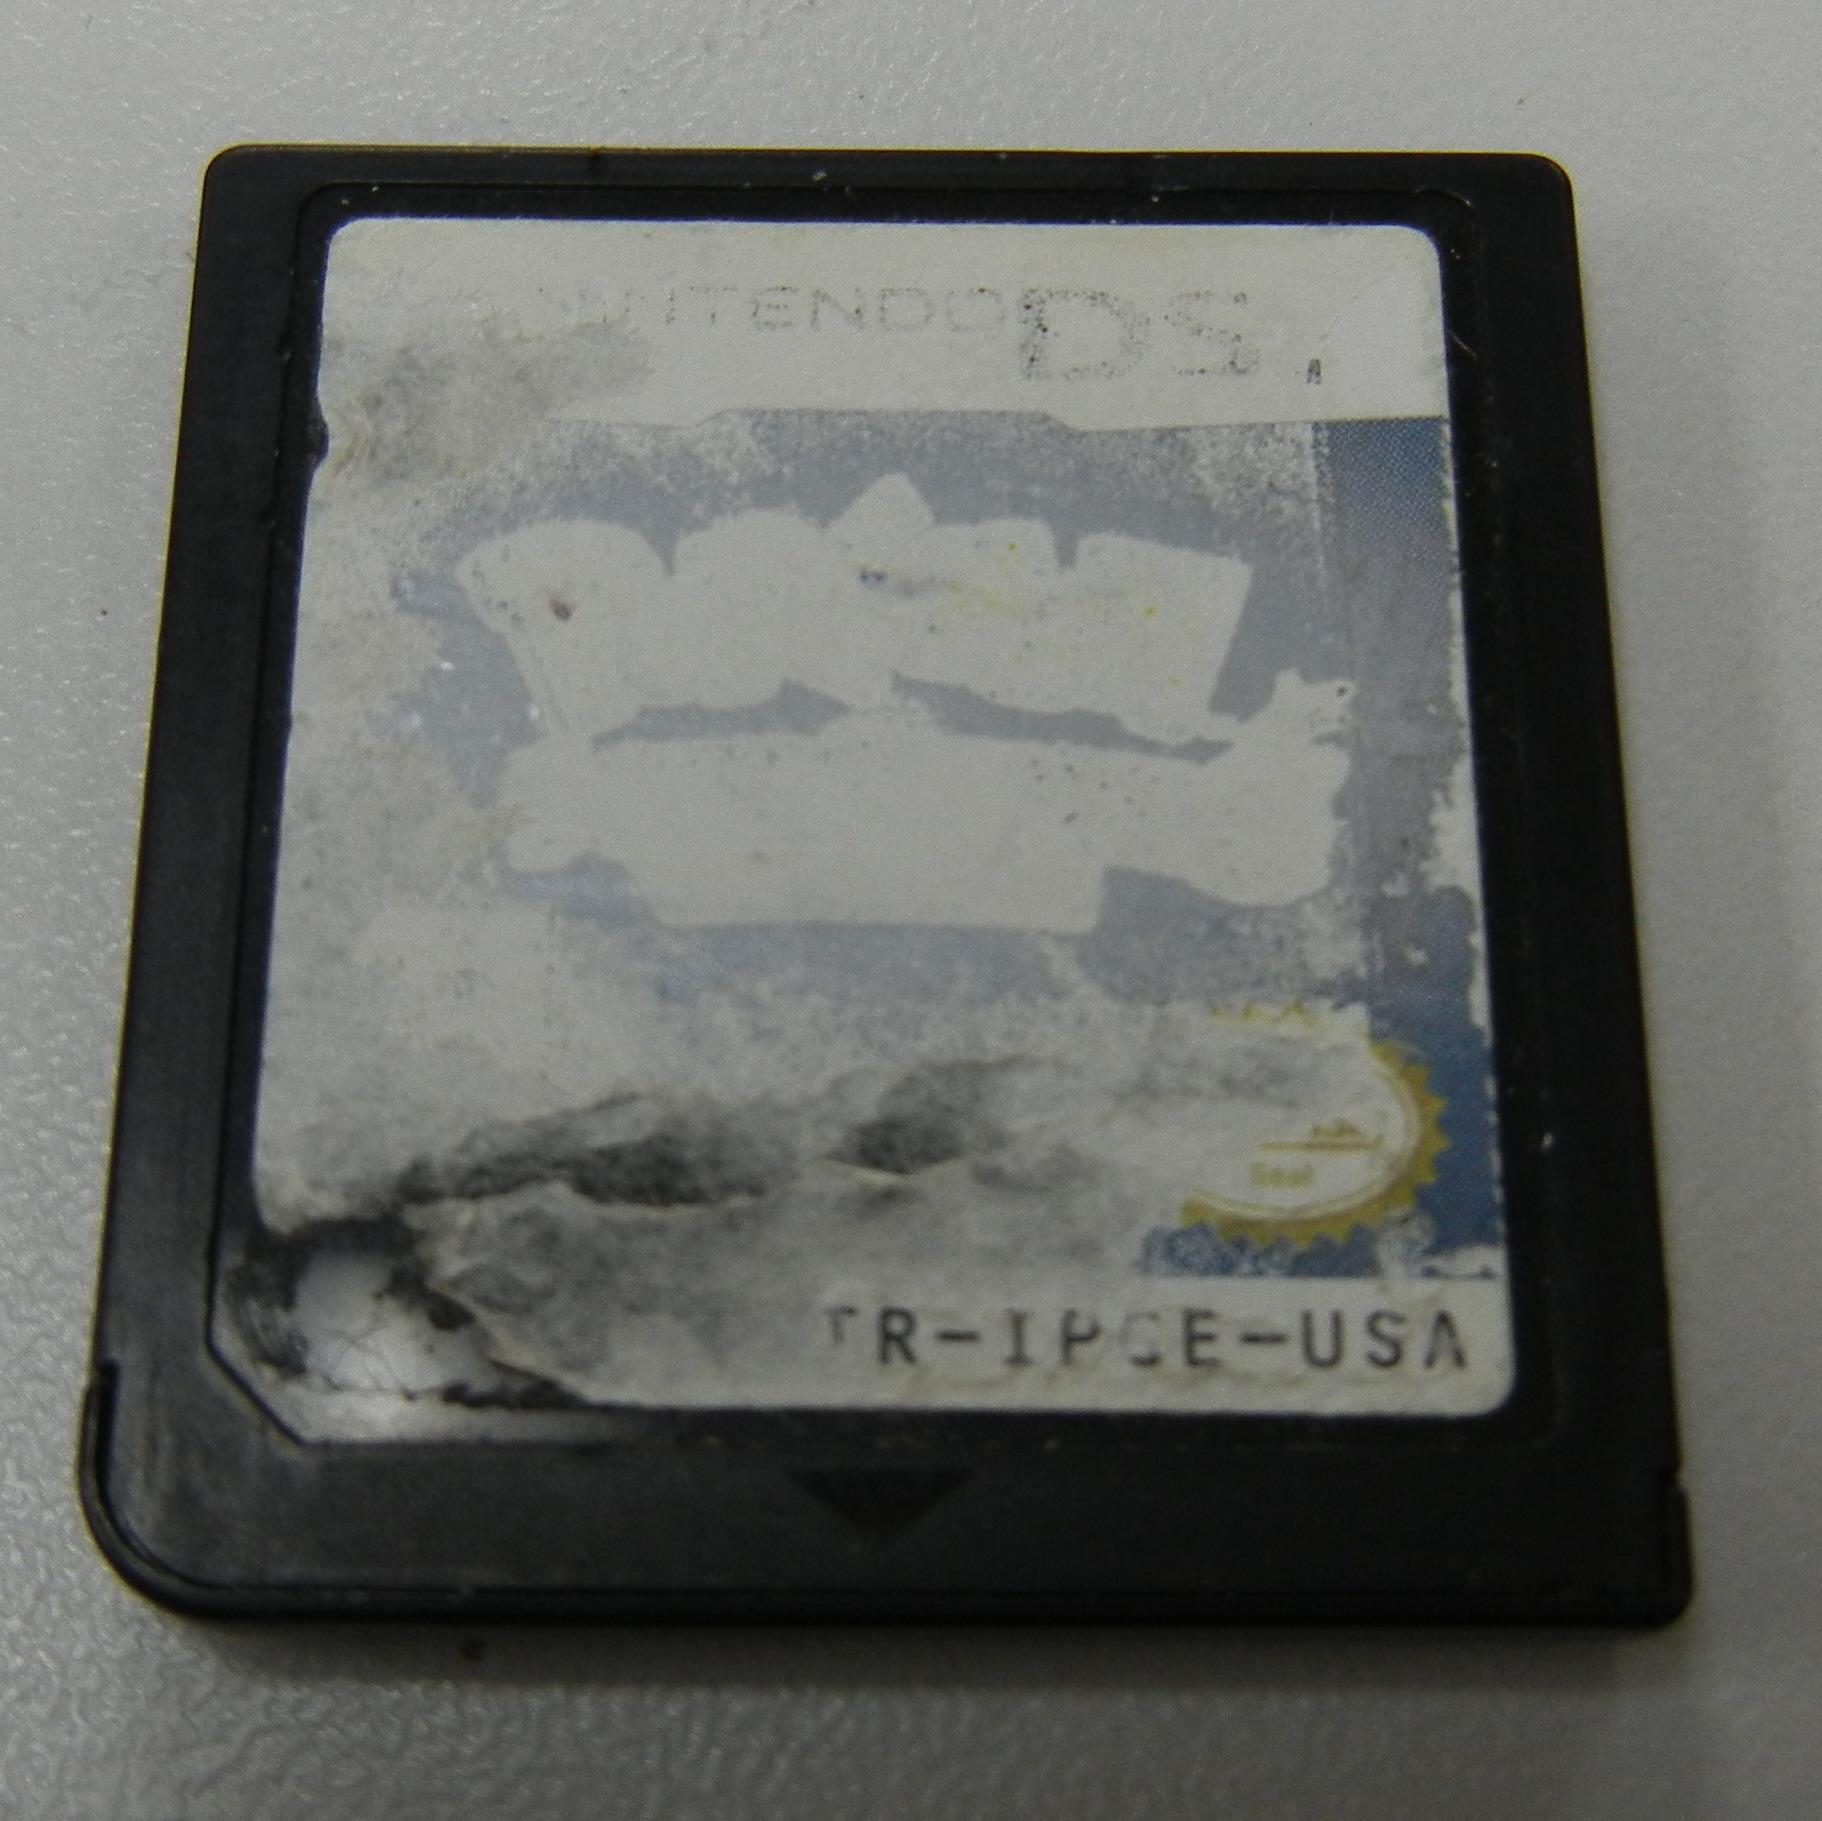 POKEMON SOULSILVER  - NINTENDO DS GAME